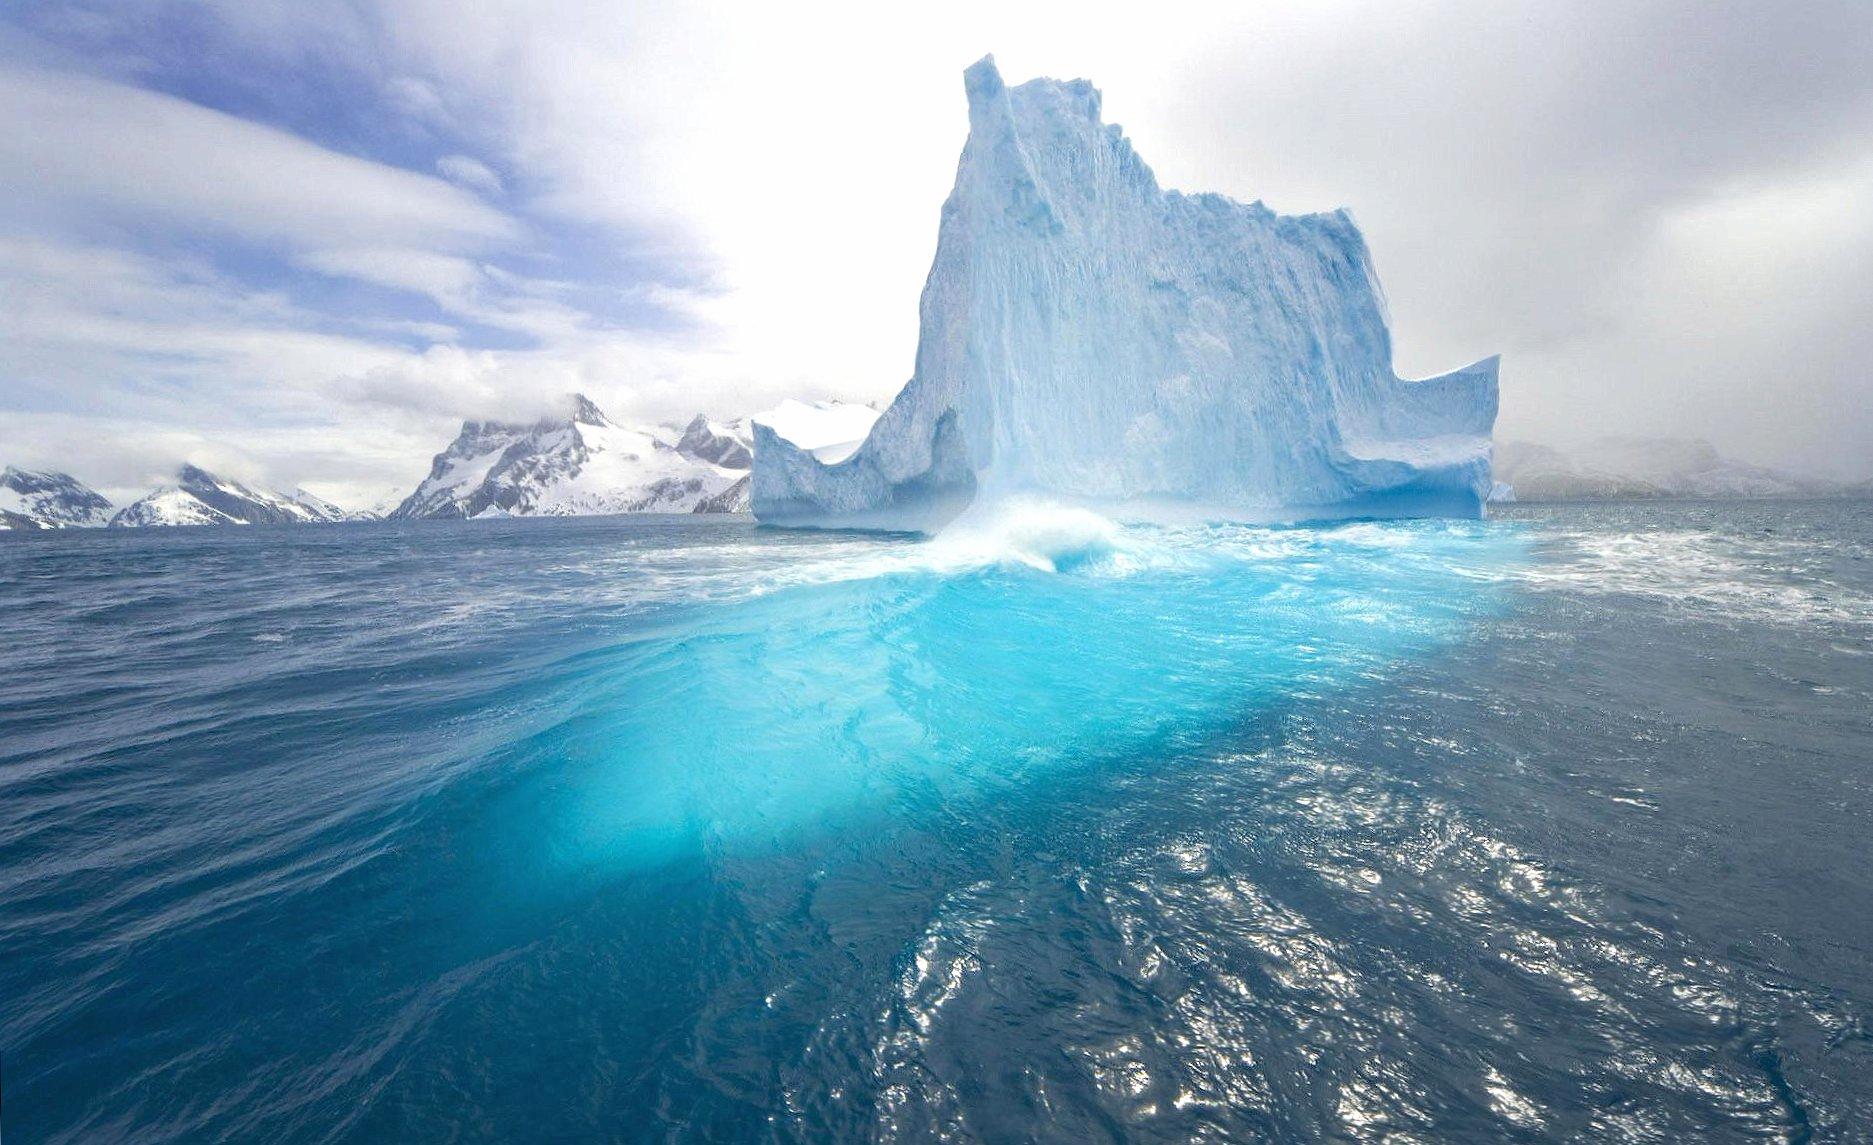 Big iceberg wallpapers HD quality